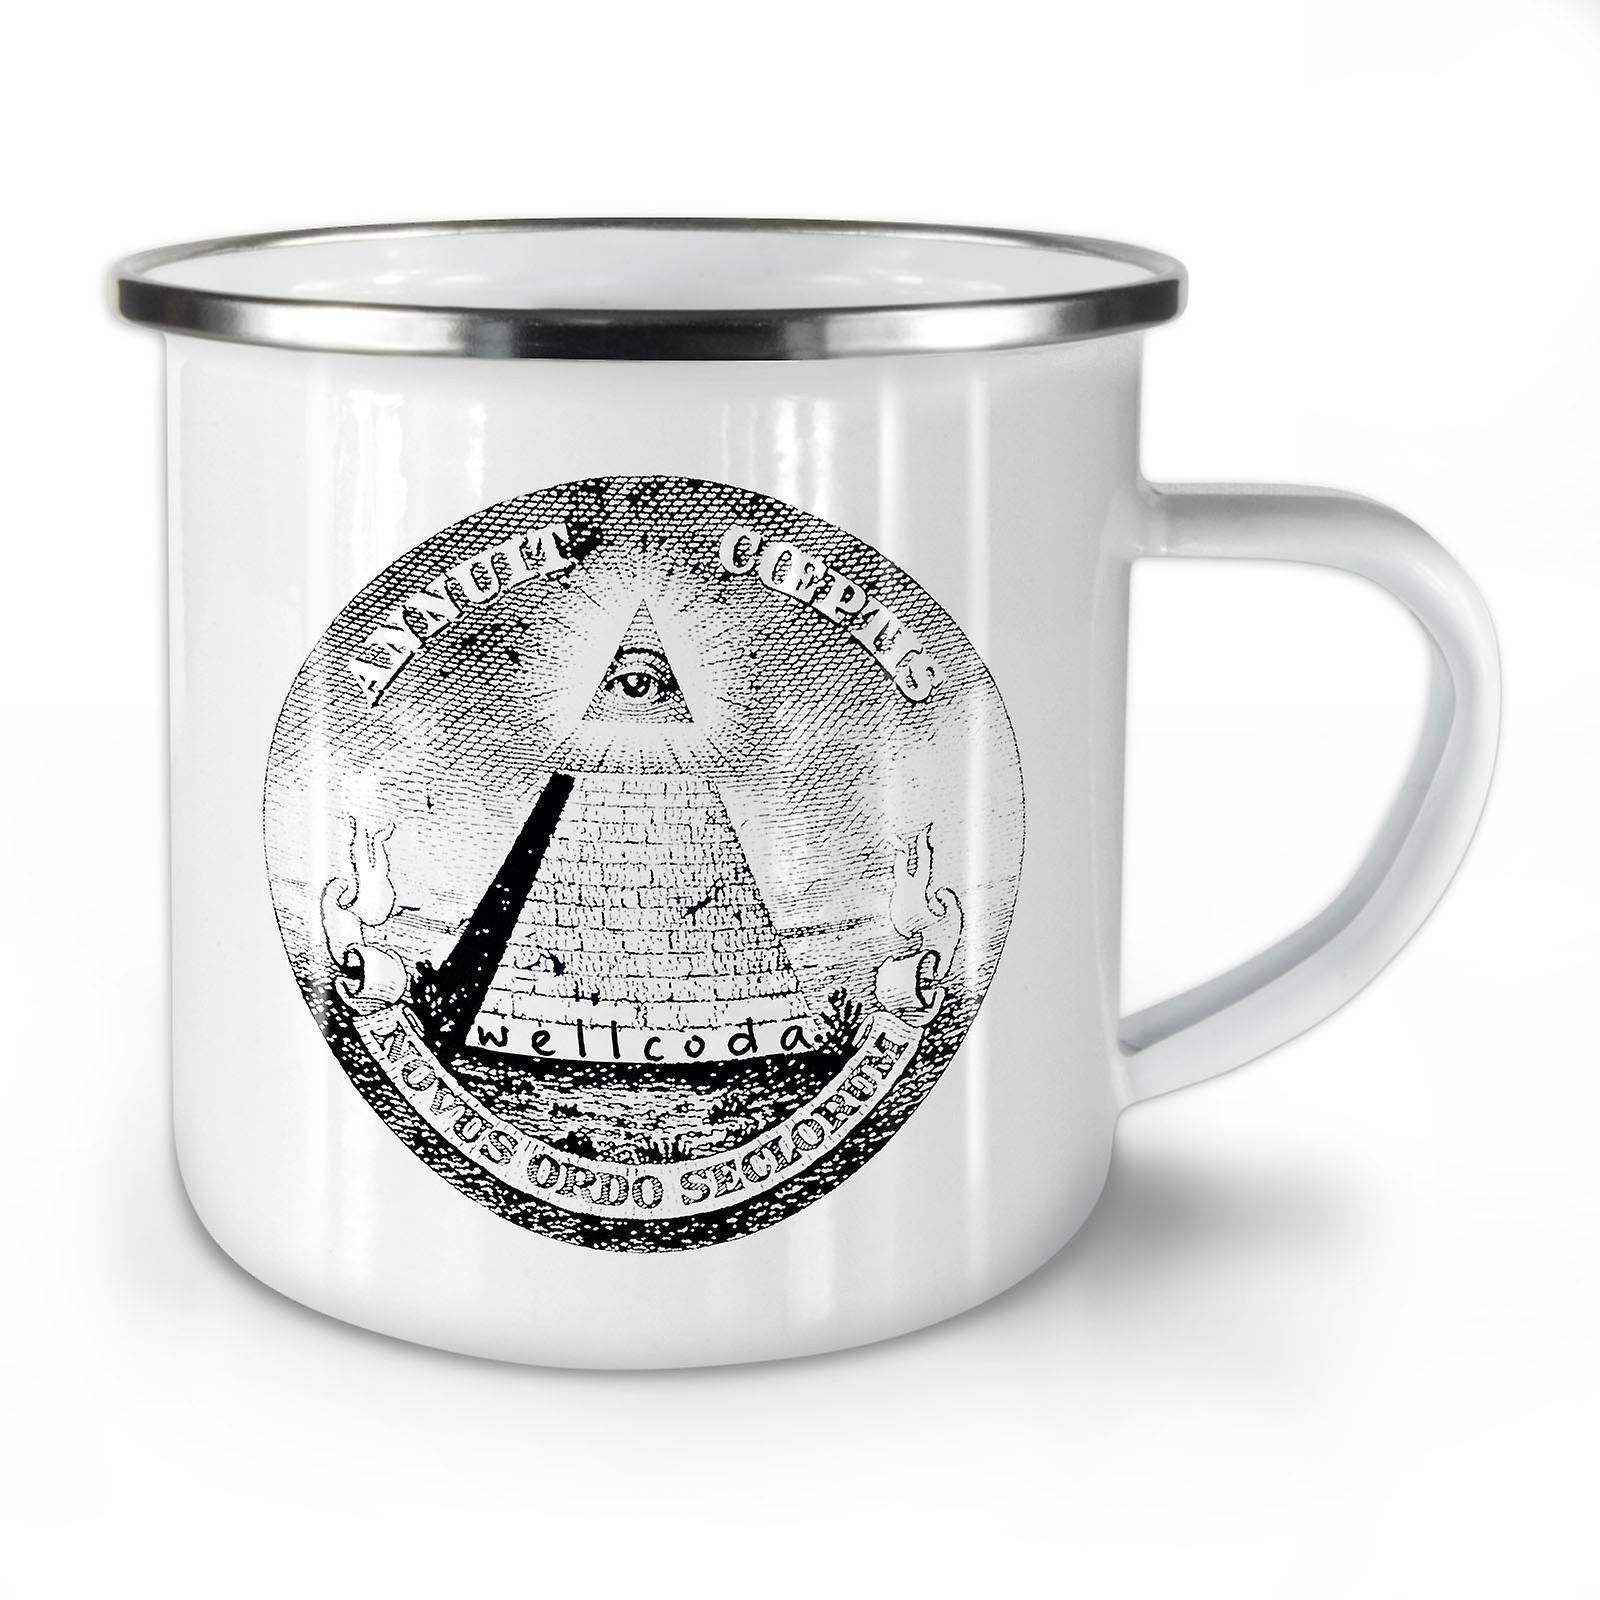 New OzWellcoda Enamel Coffee Mug10 Whitetea Triangle Pyramid wTOklXPuZi